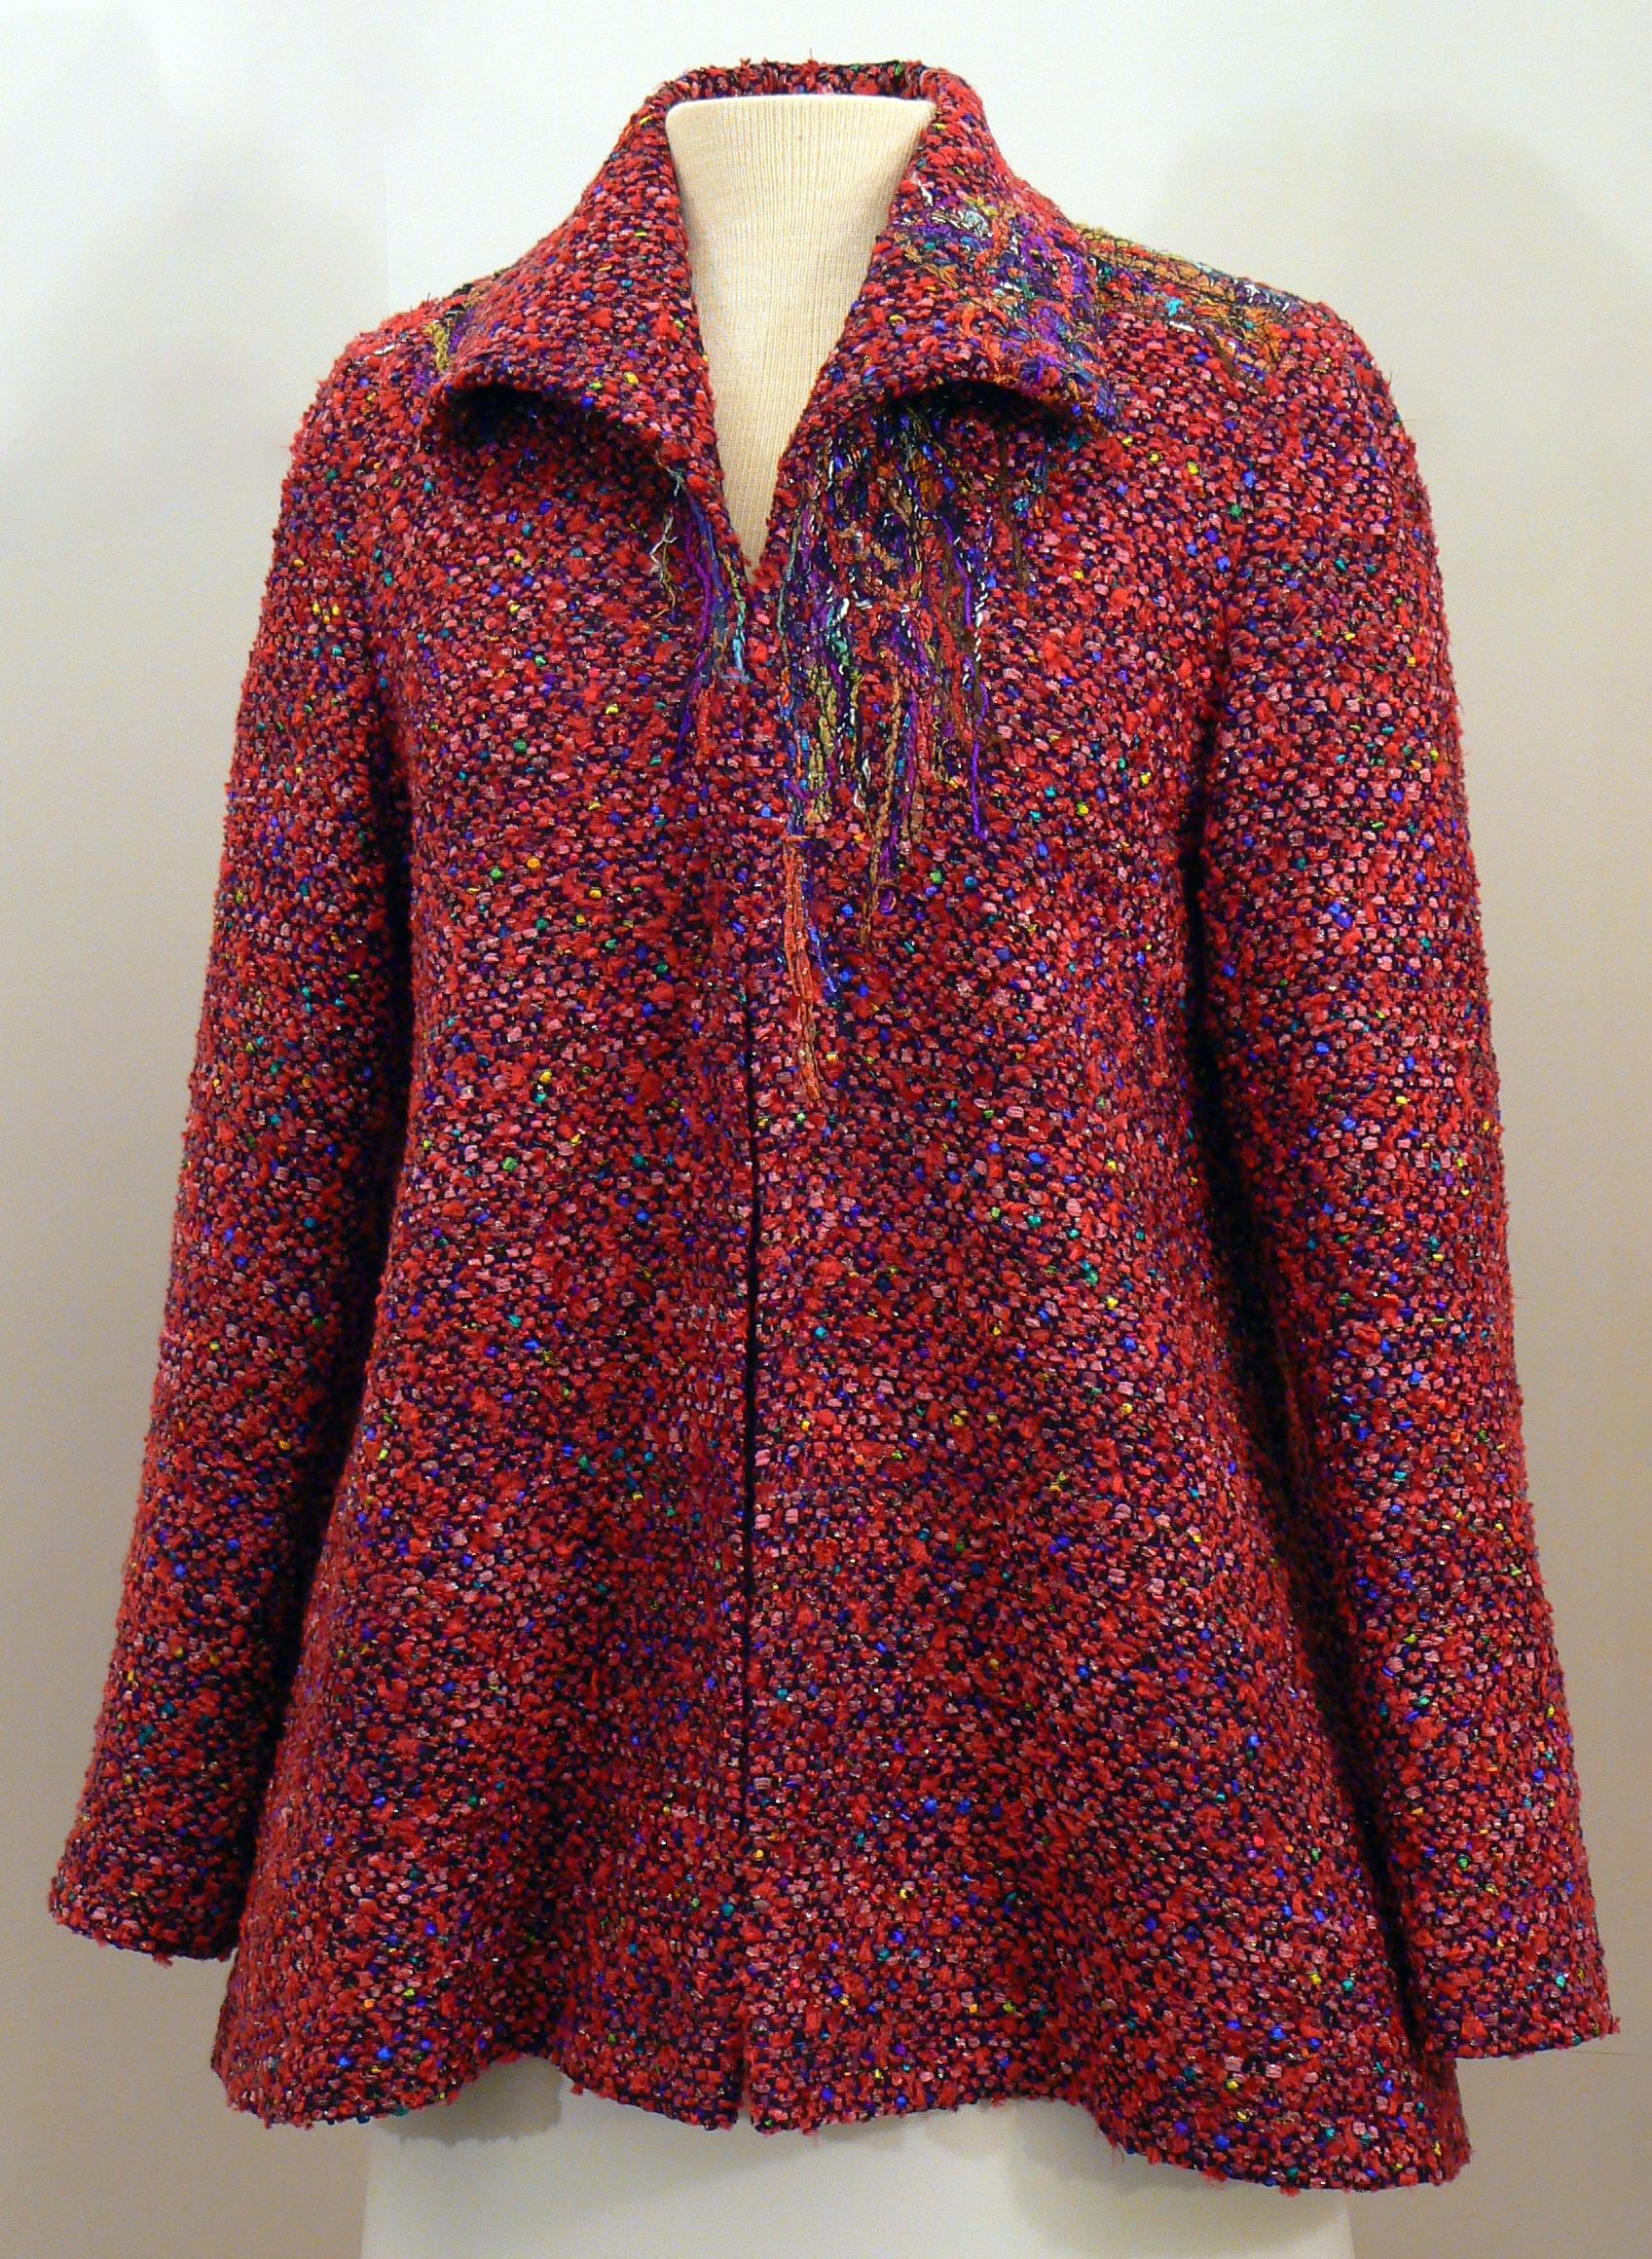 Handwoven Clothing, Wearable Art, Kathleen Weir-West, 19-001.JPG